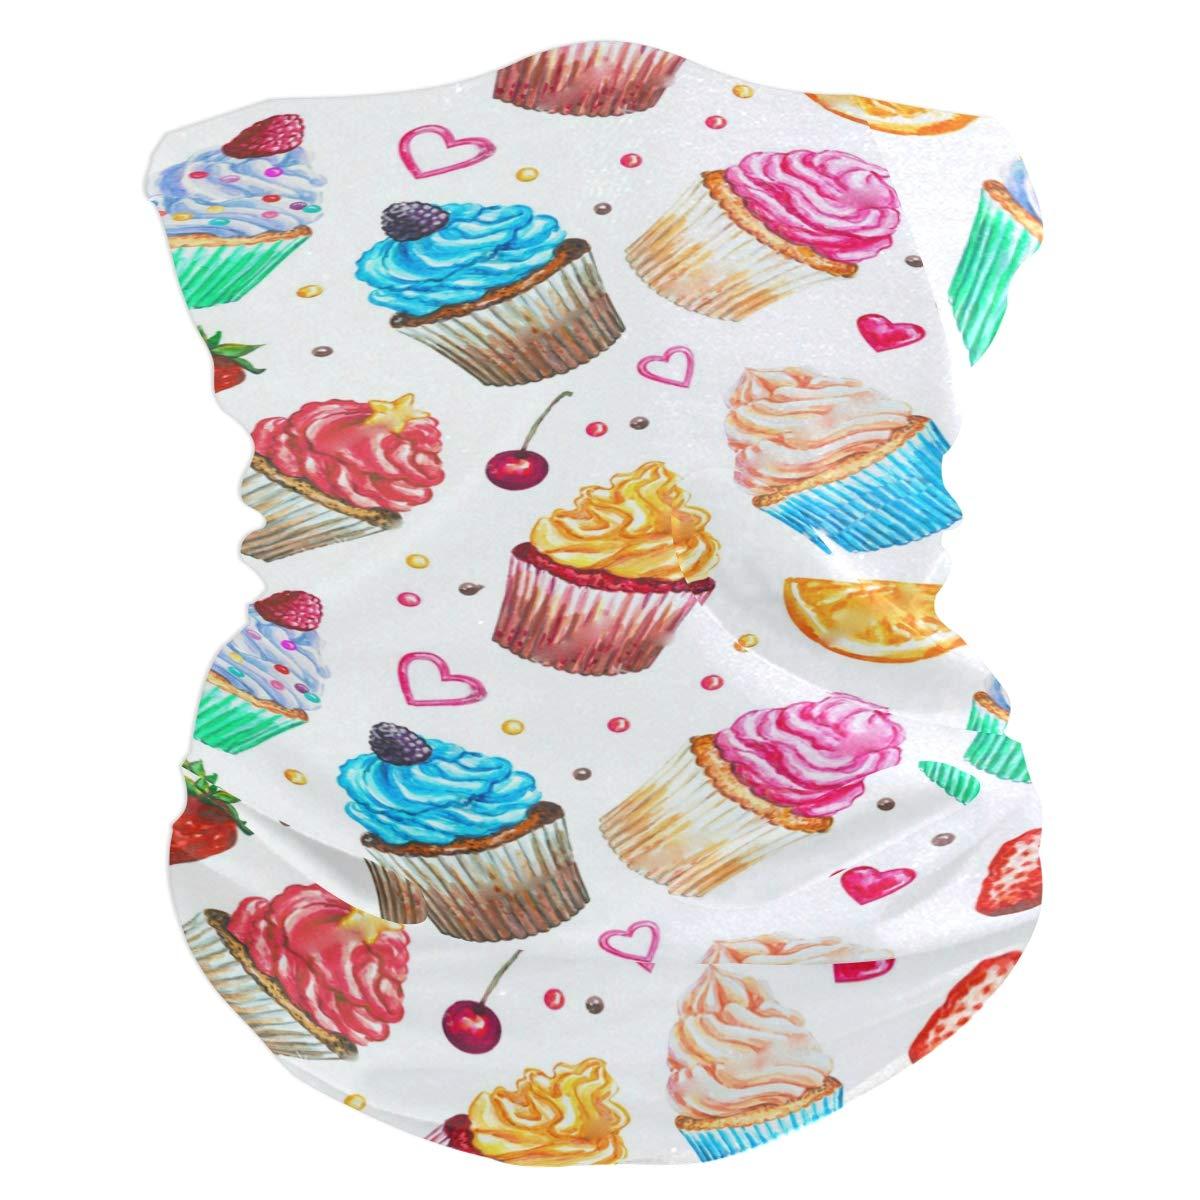 SLHFPX Watercolor Cupcake Strawberry Headband WoBandana Balaclava,Neck Warmer,Face Mask,Headwear Foulard